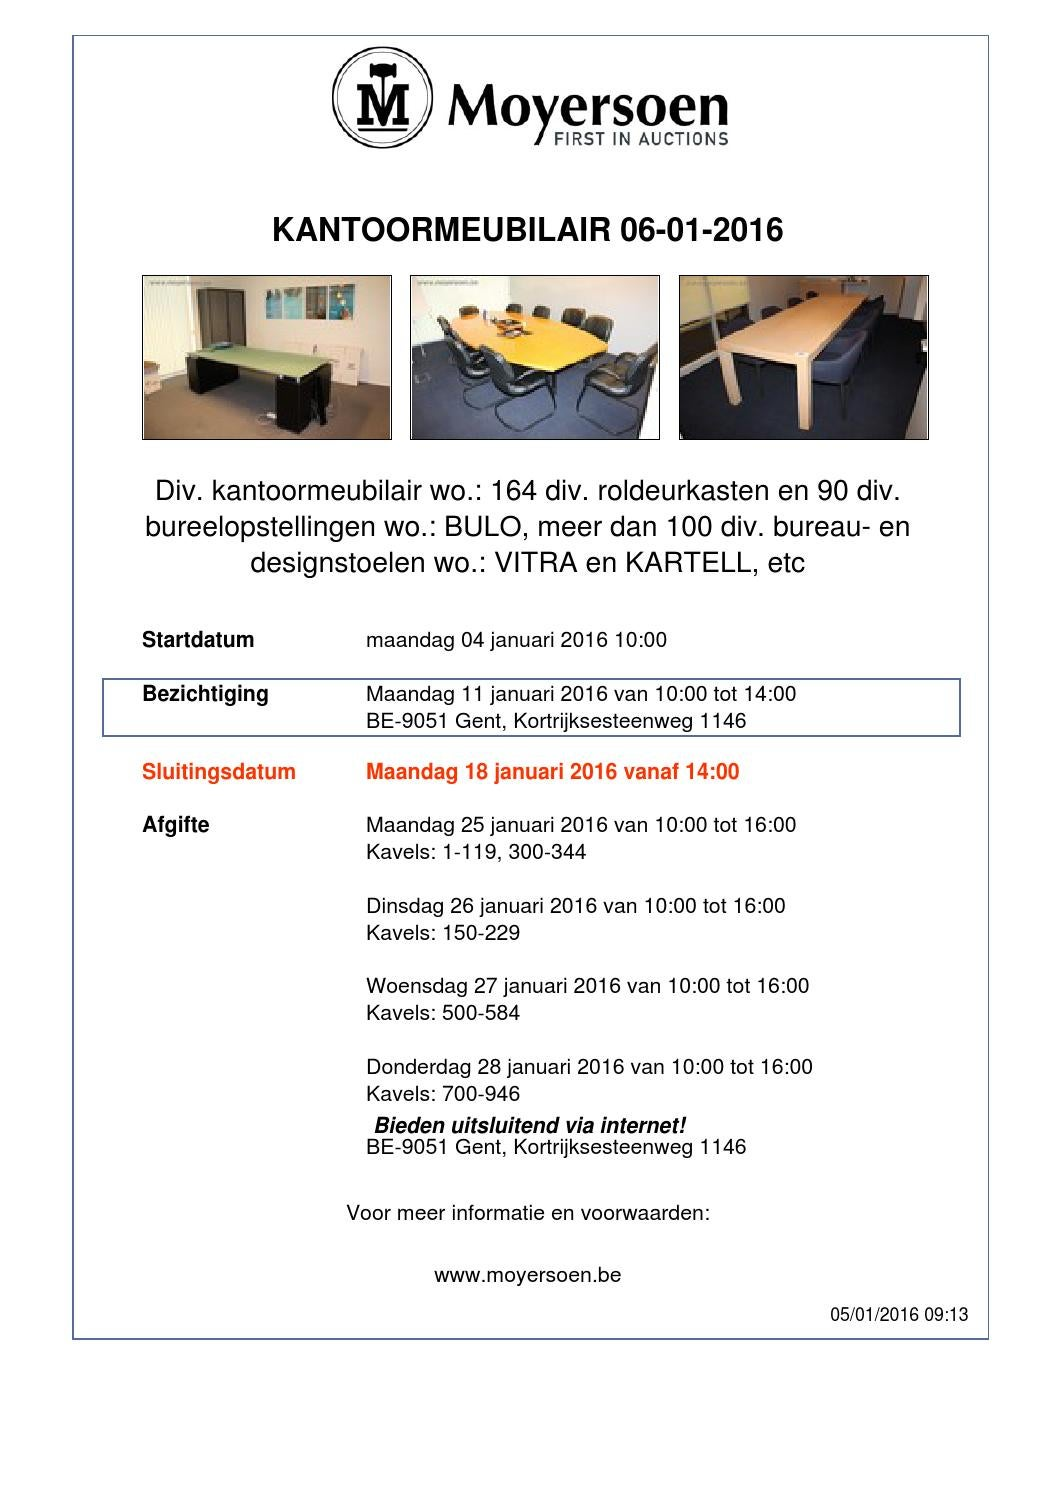 kantoormeubilair 06 01 2016 by moyersoen issuu